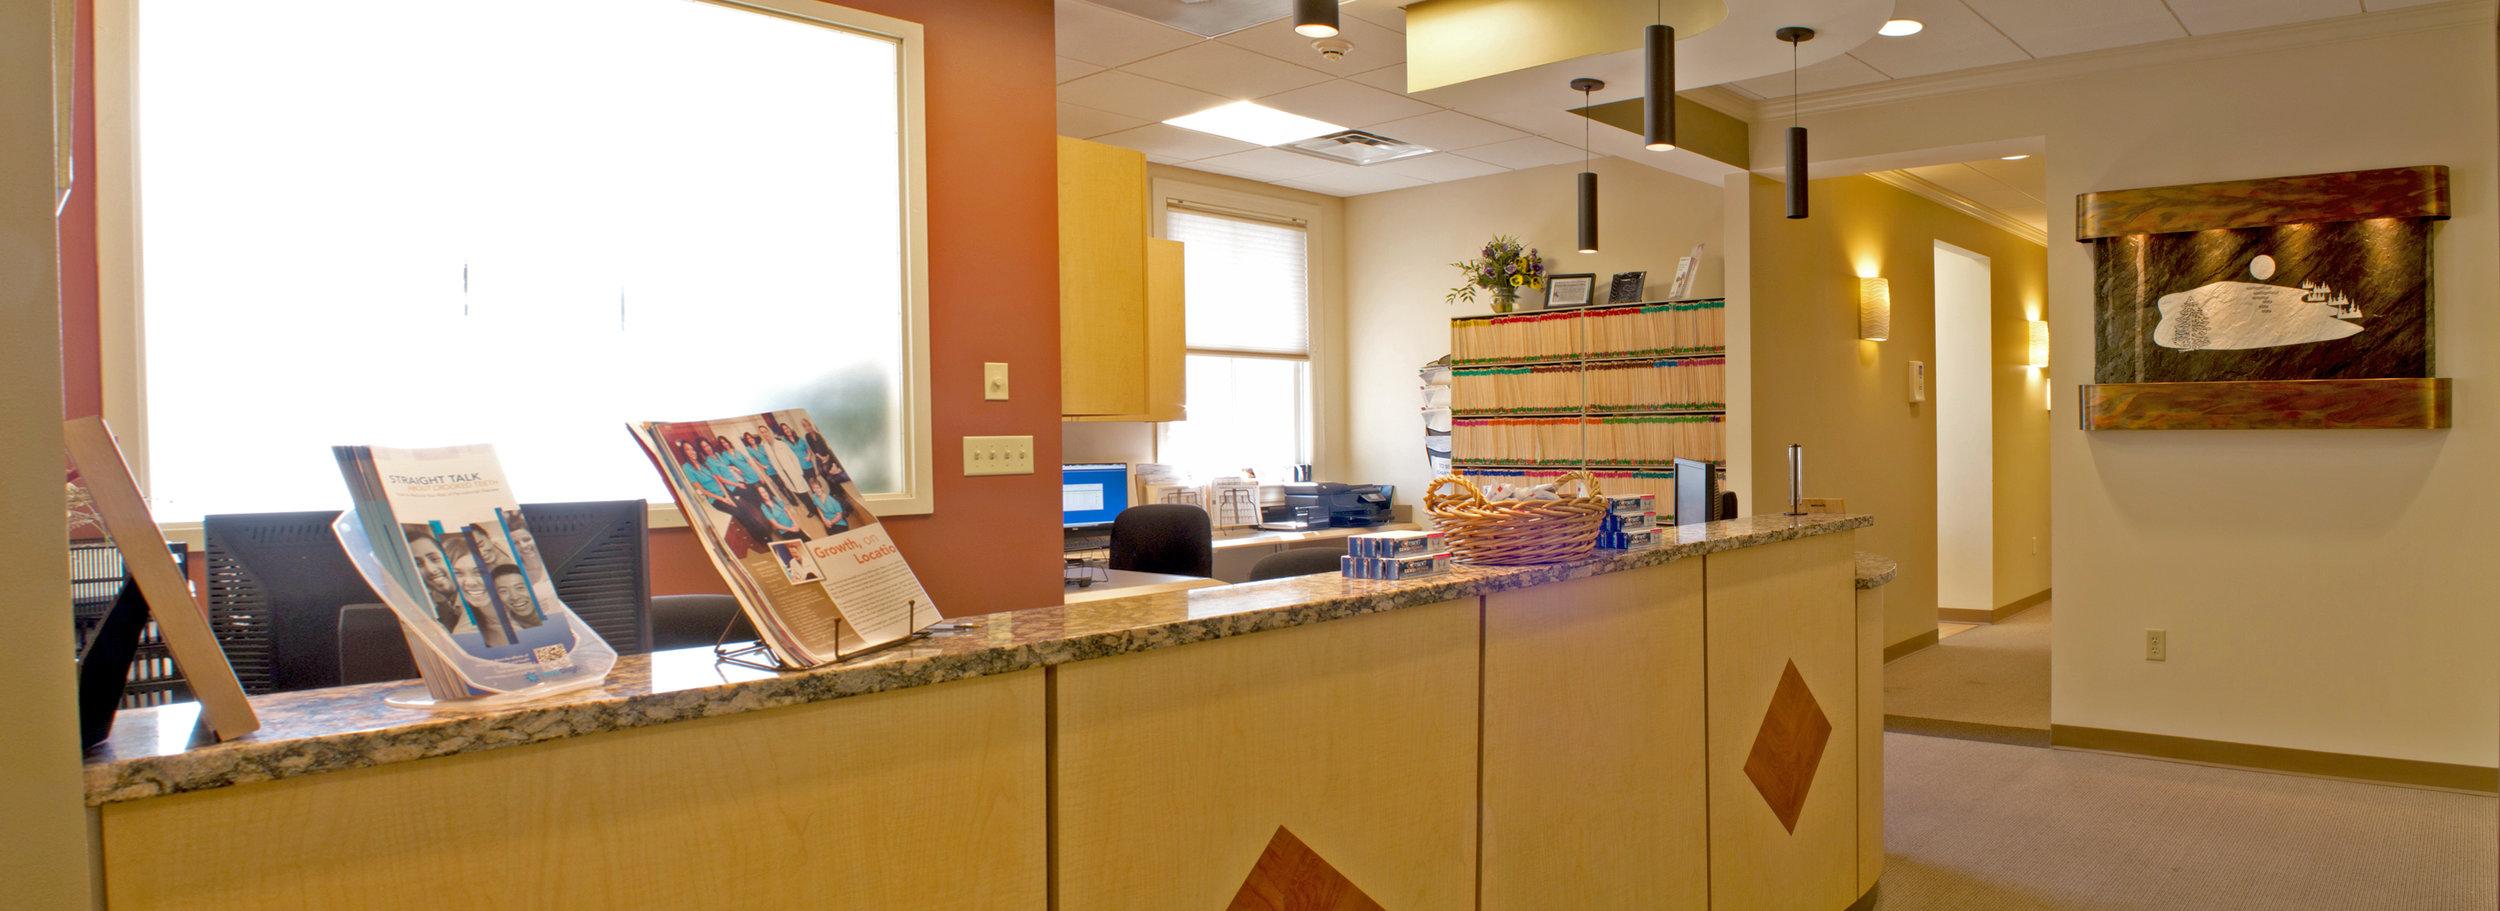 Silver Lake Dental Office - Tewksbury, MA